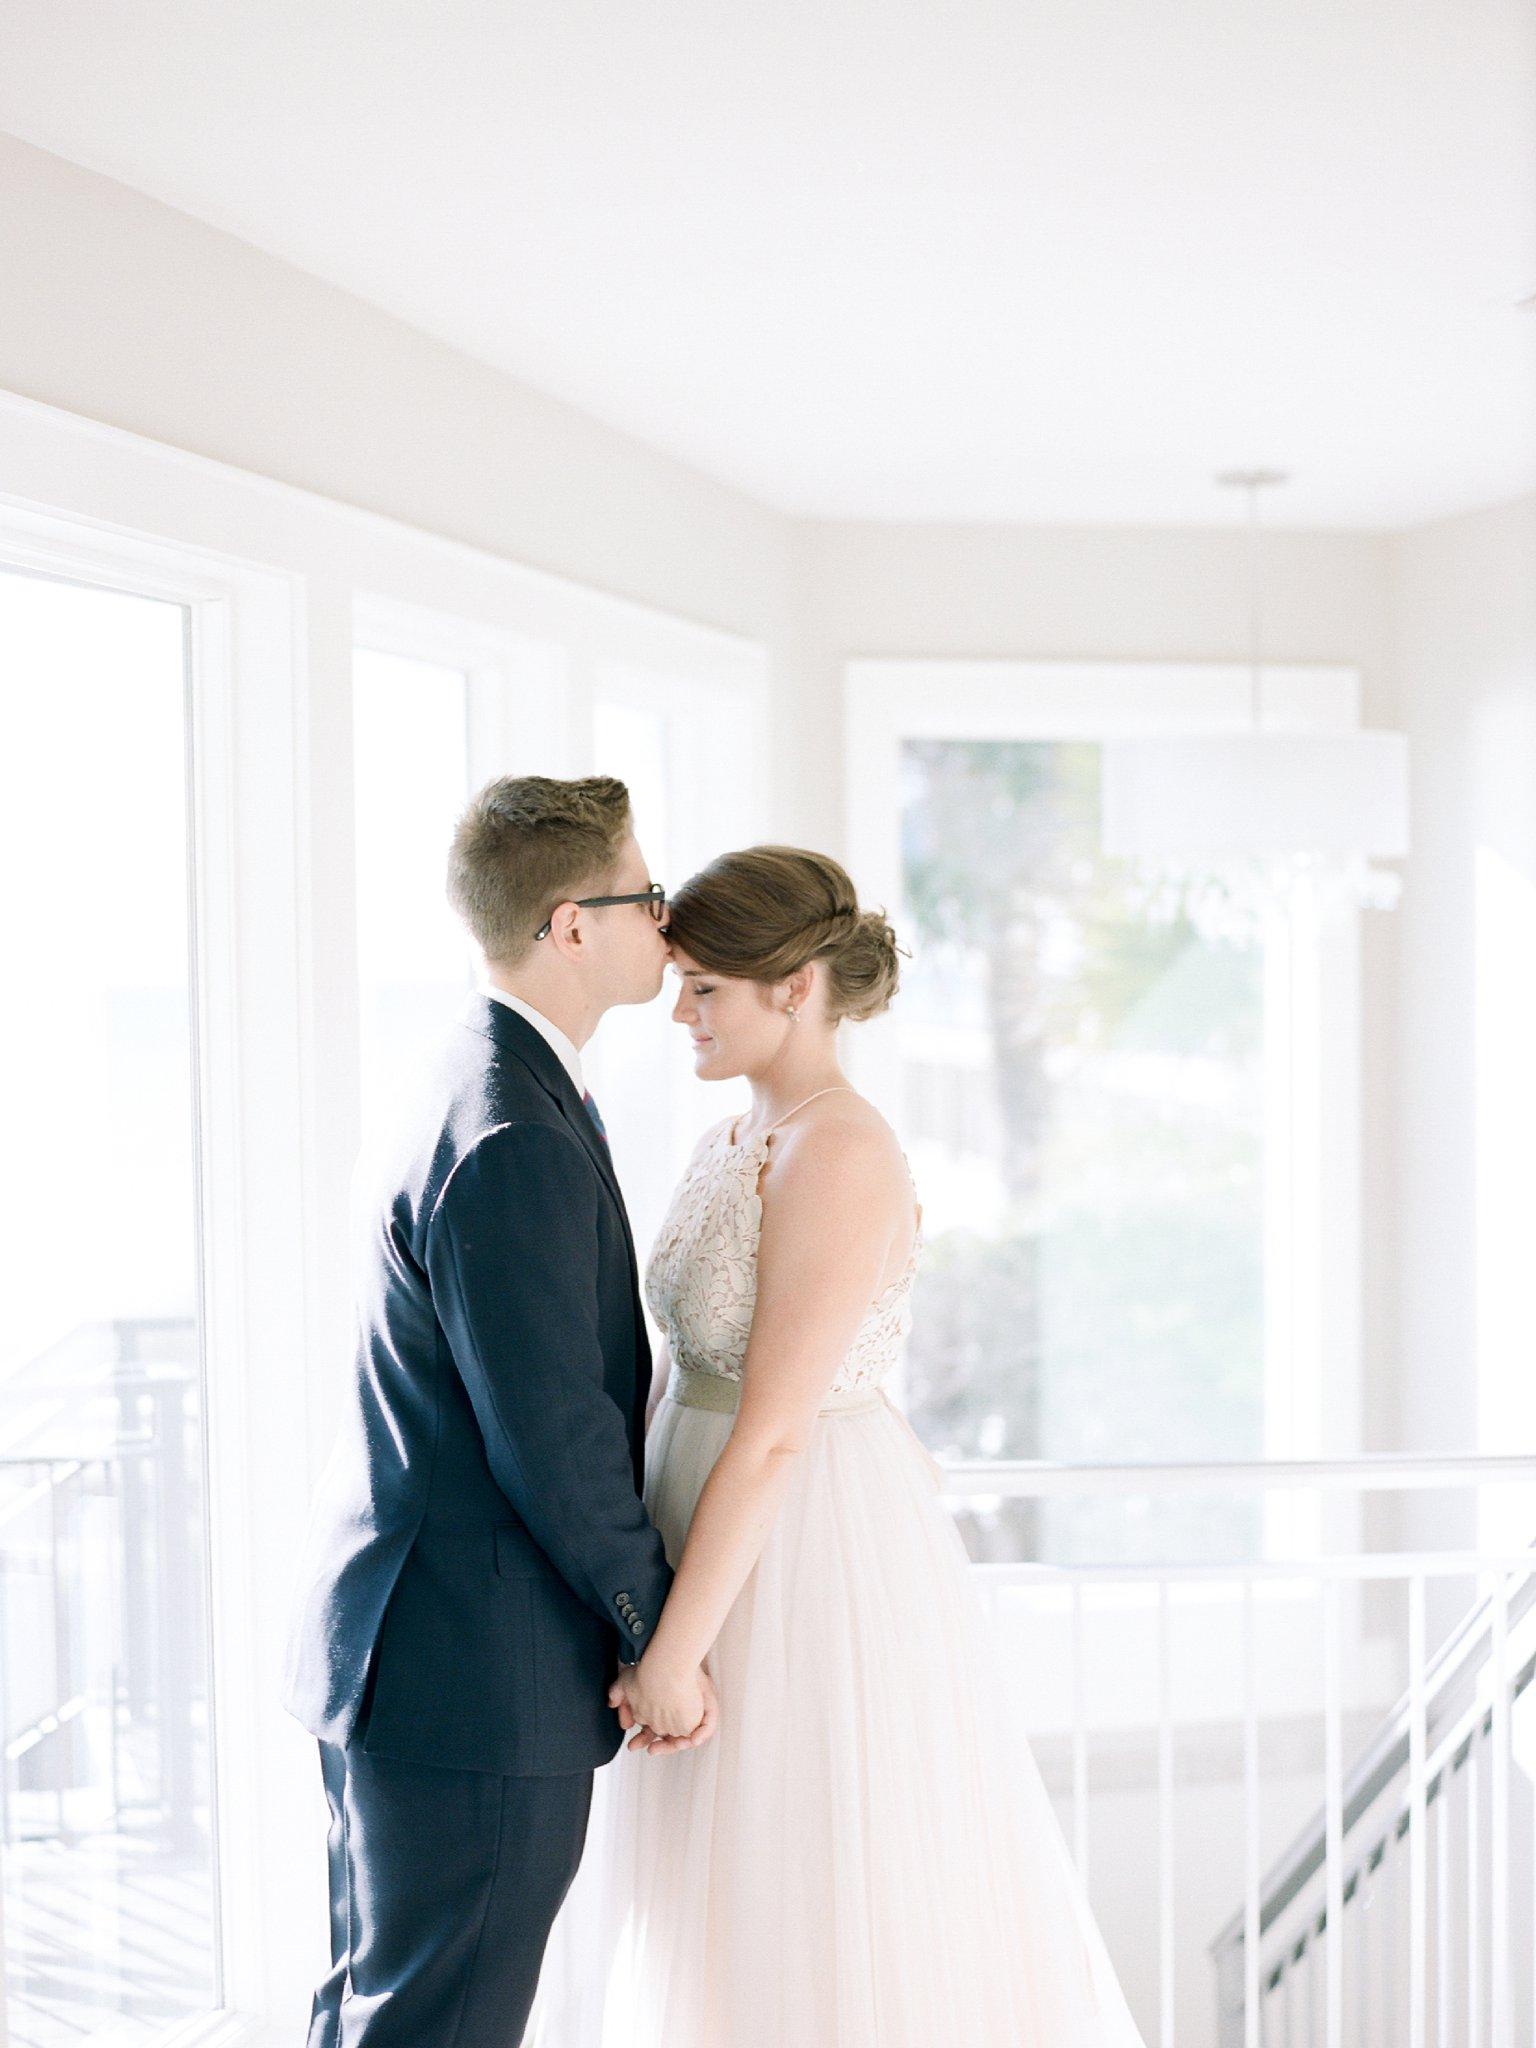 inlet beach wedding 30a wedding inlet beach wedding photographer shannon griffin photography_0043.jpg